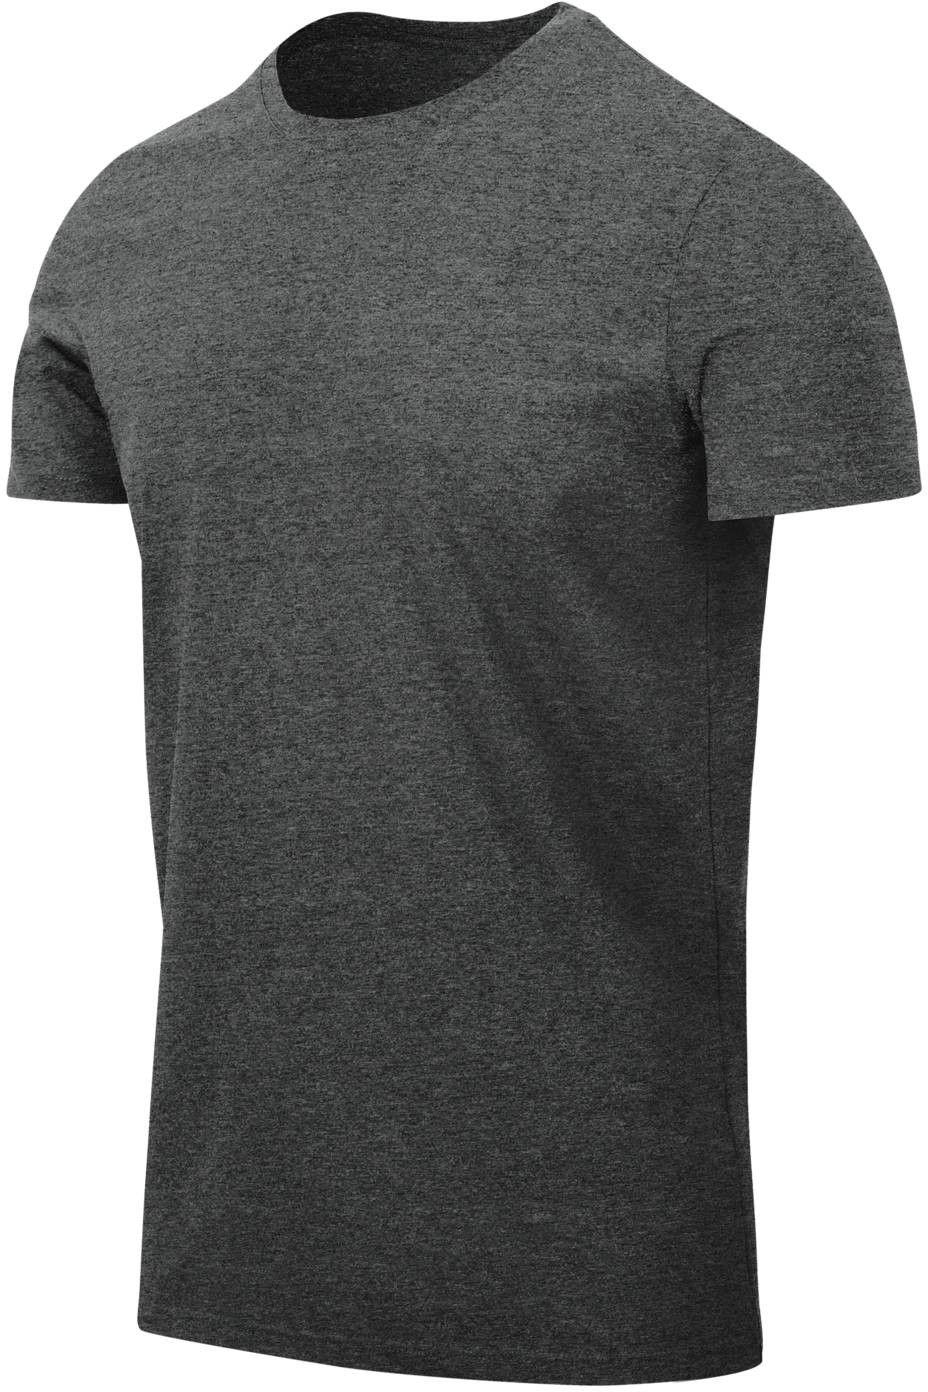 Koszulka T-Shirt Helikon Slim Melange Black-Grey (TS-TSS-CC-M1) H